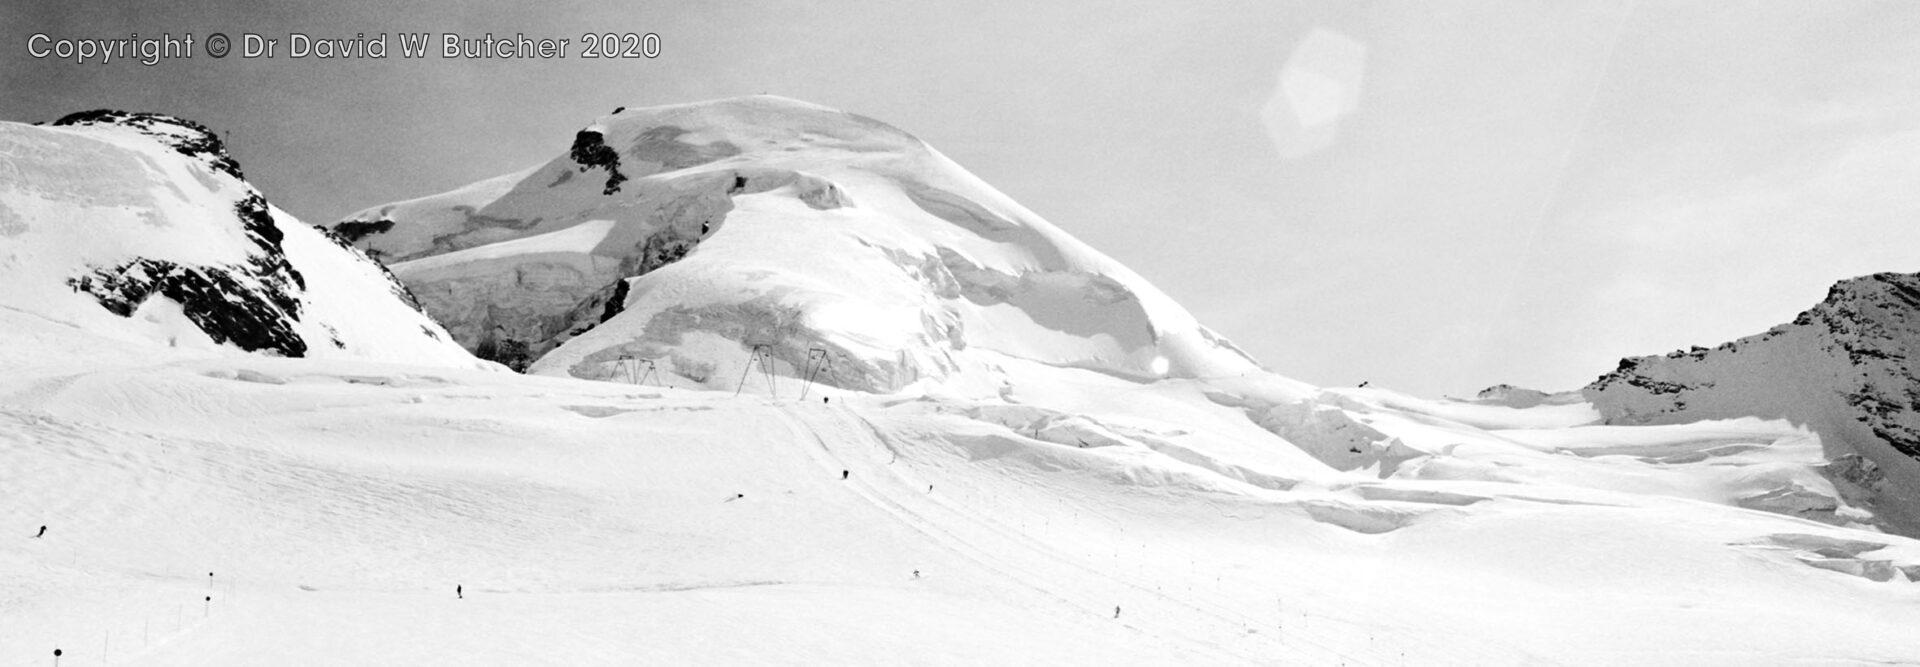 Saas Fee, Allalinhorn from Saas Fee Ski Area, Switzerland